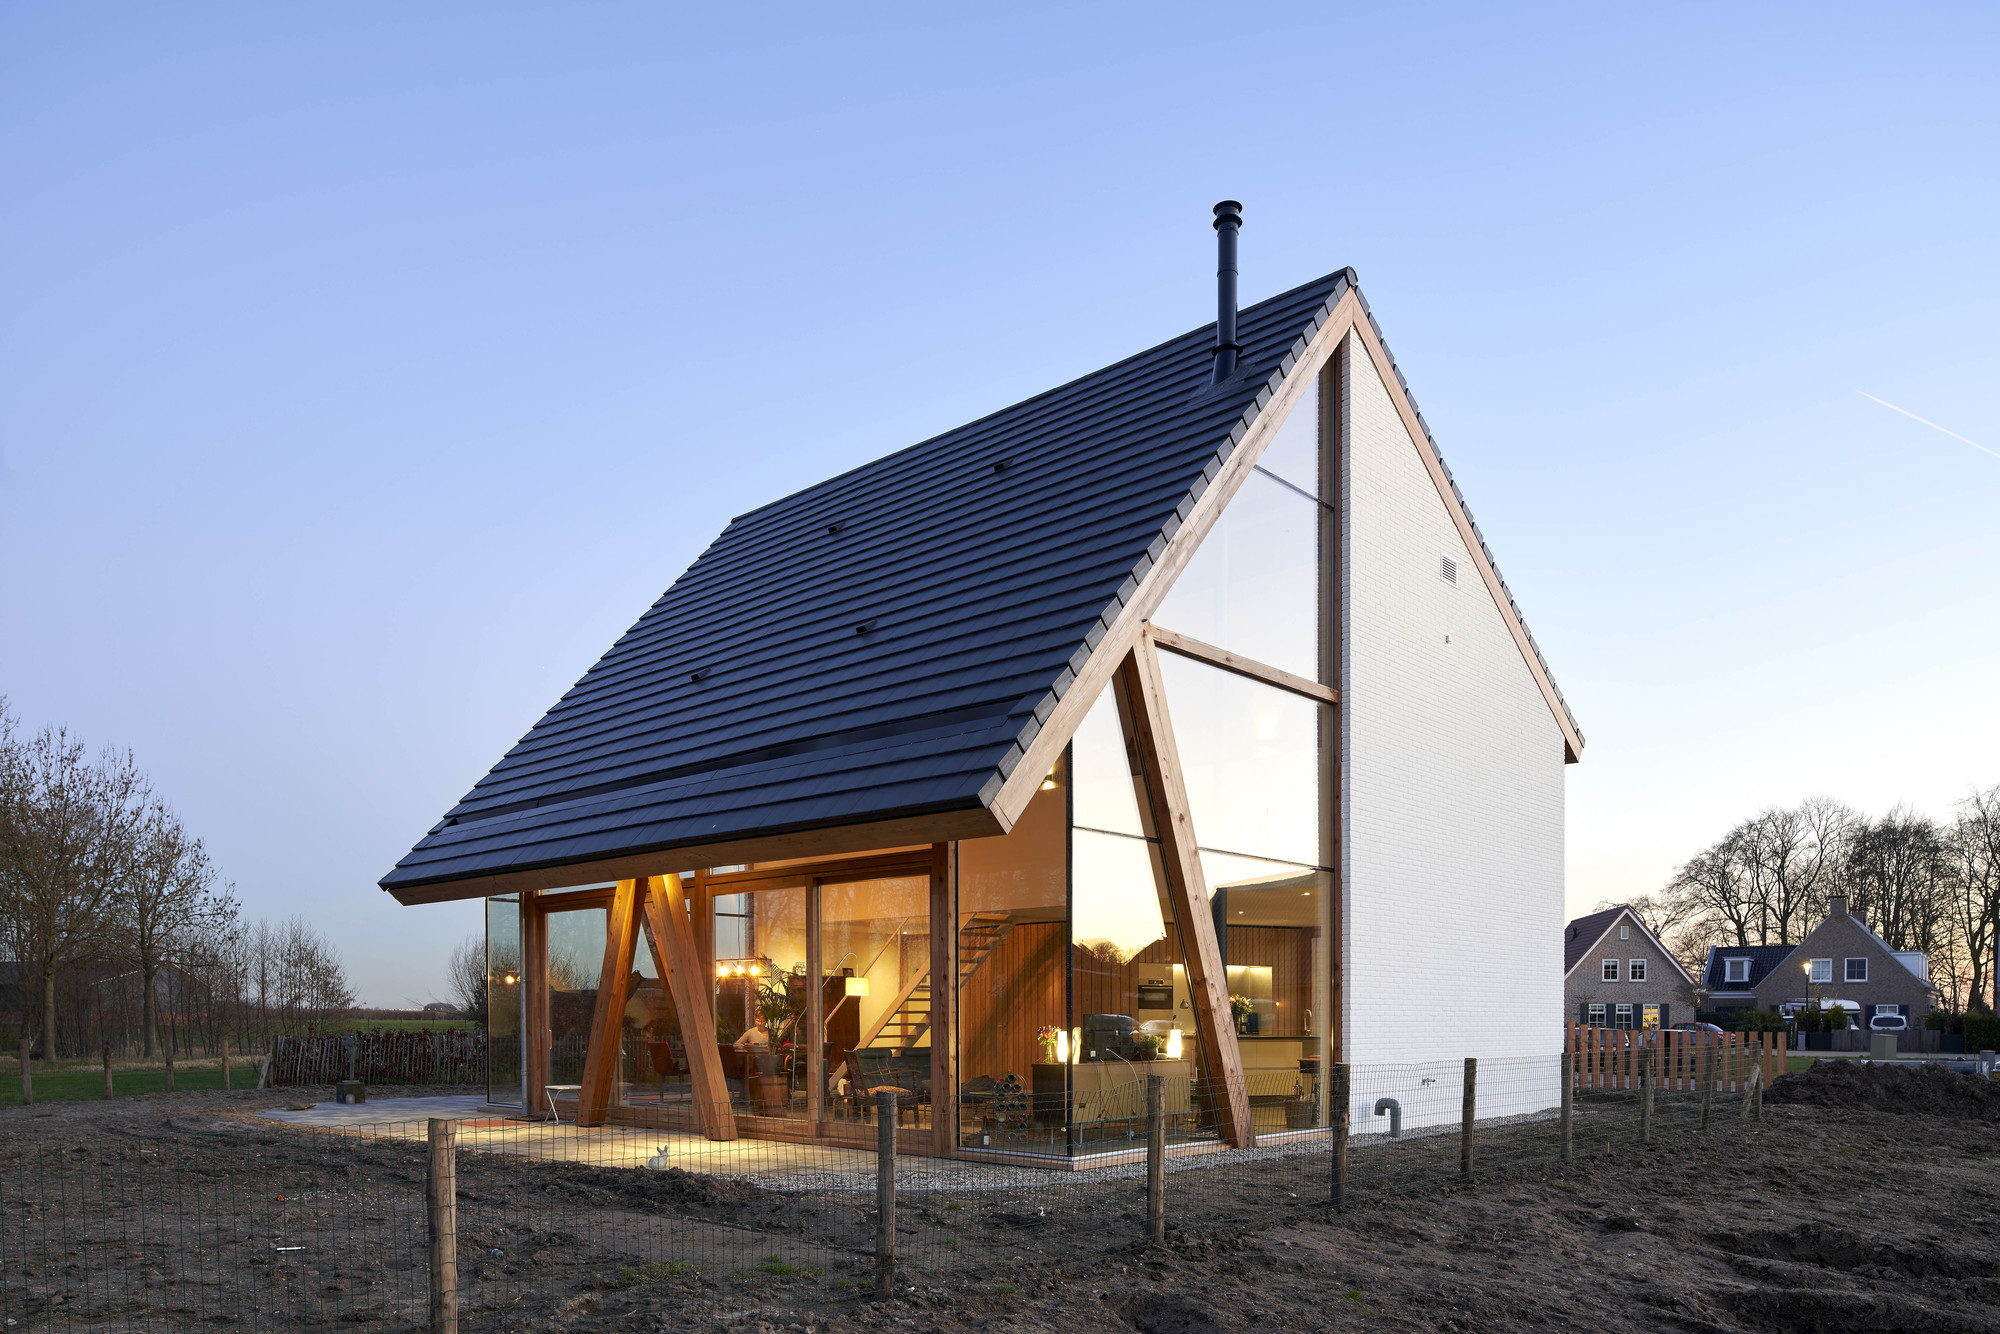 Barnhouse Werkhoven / RVArchitecture